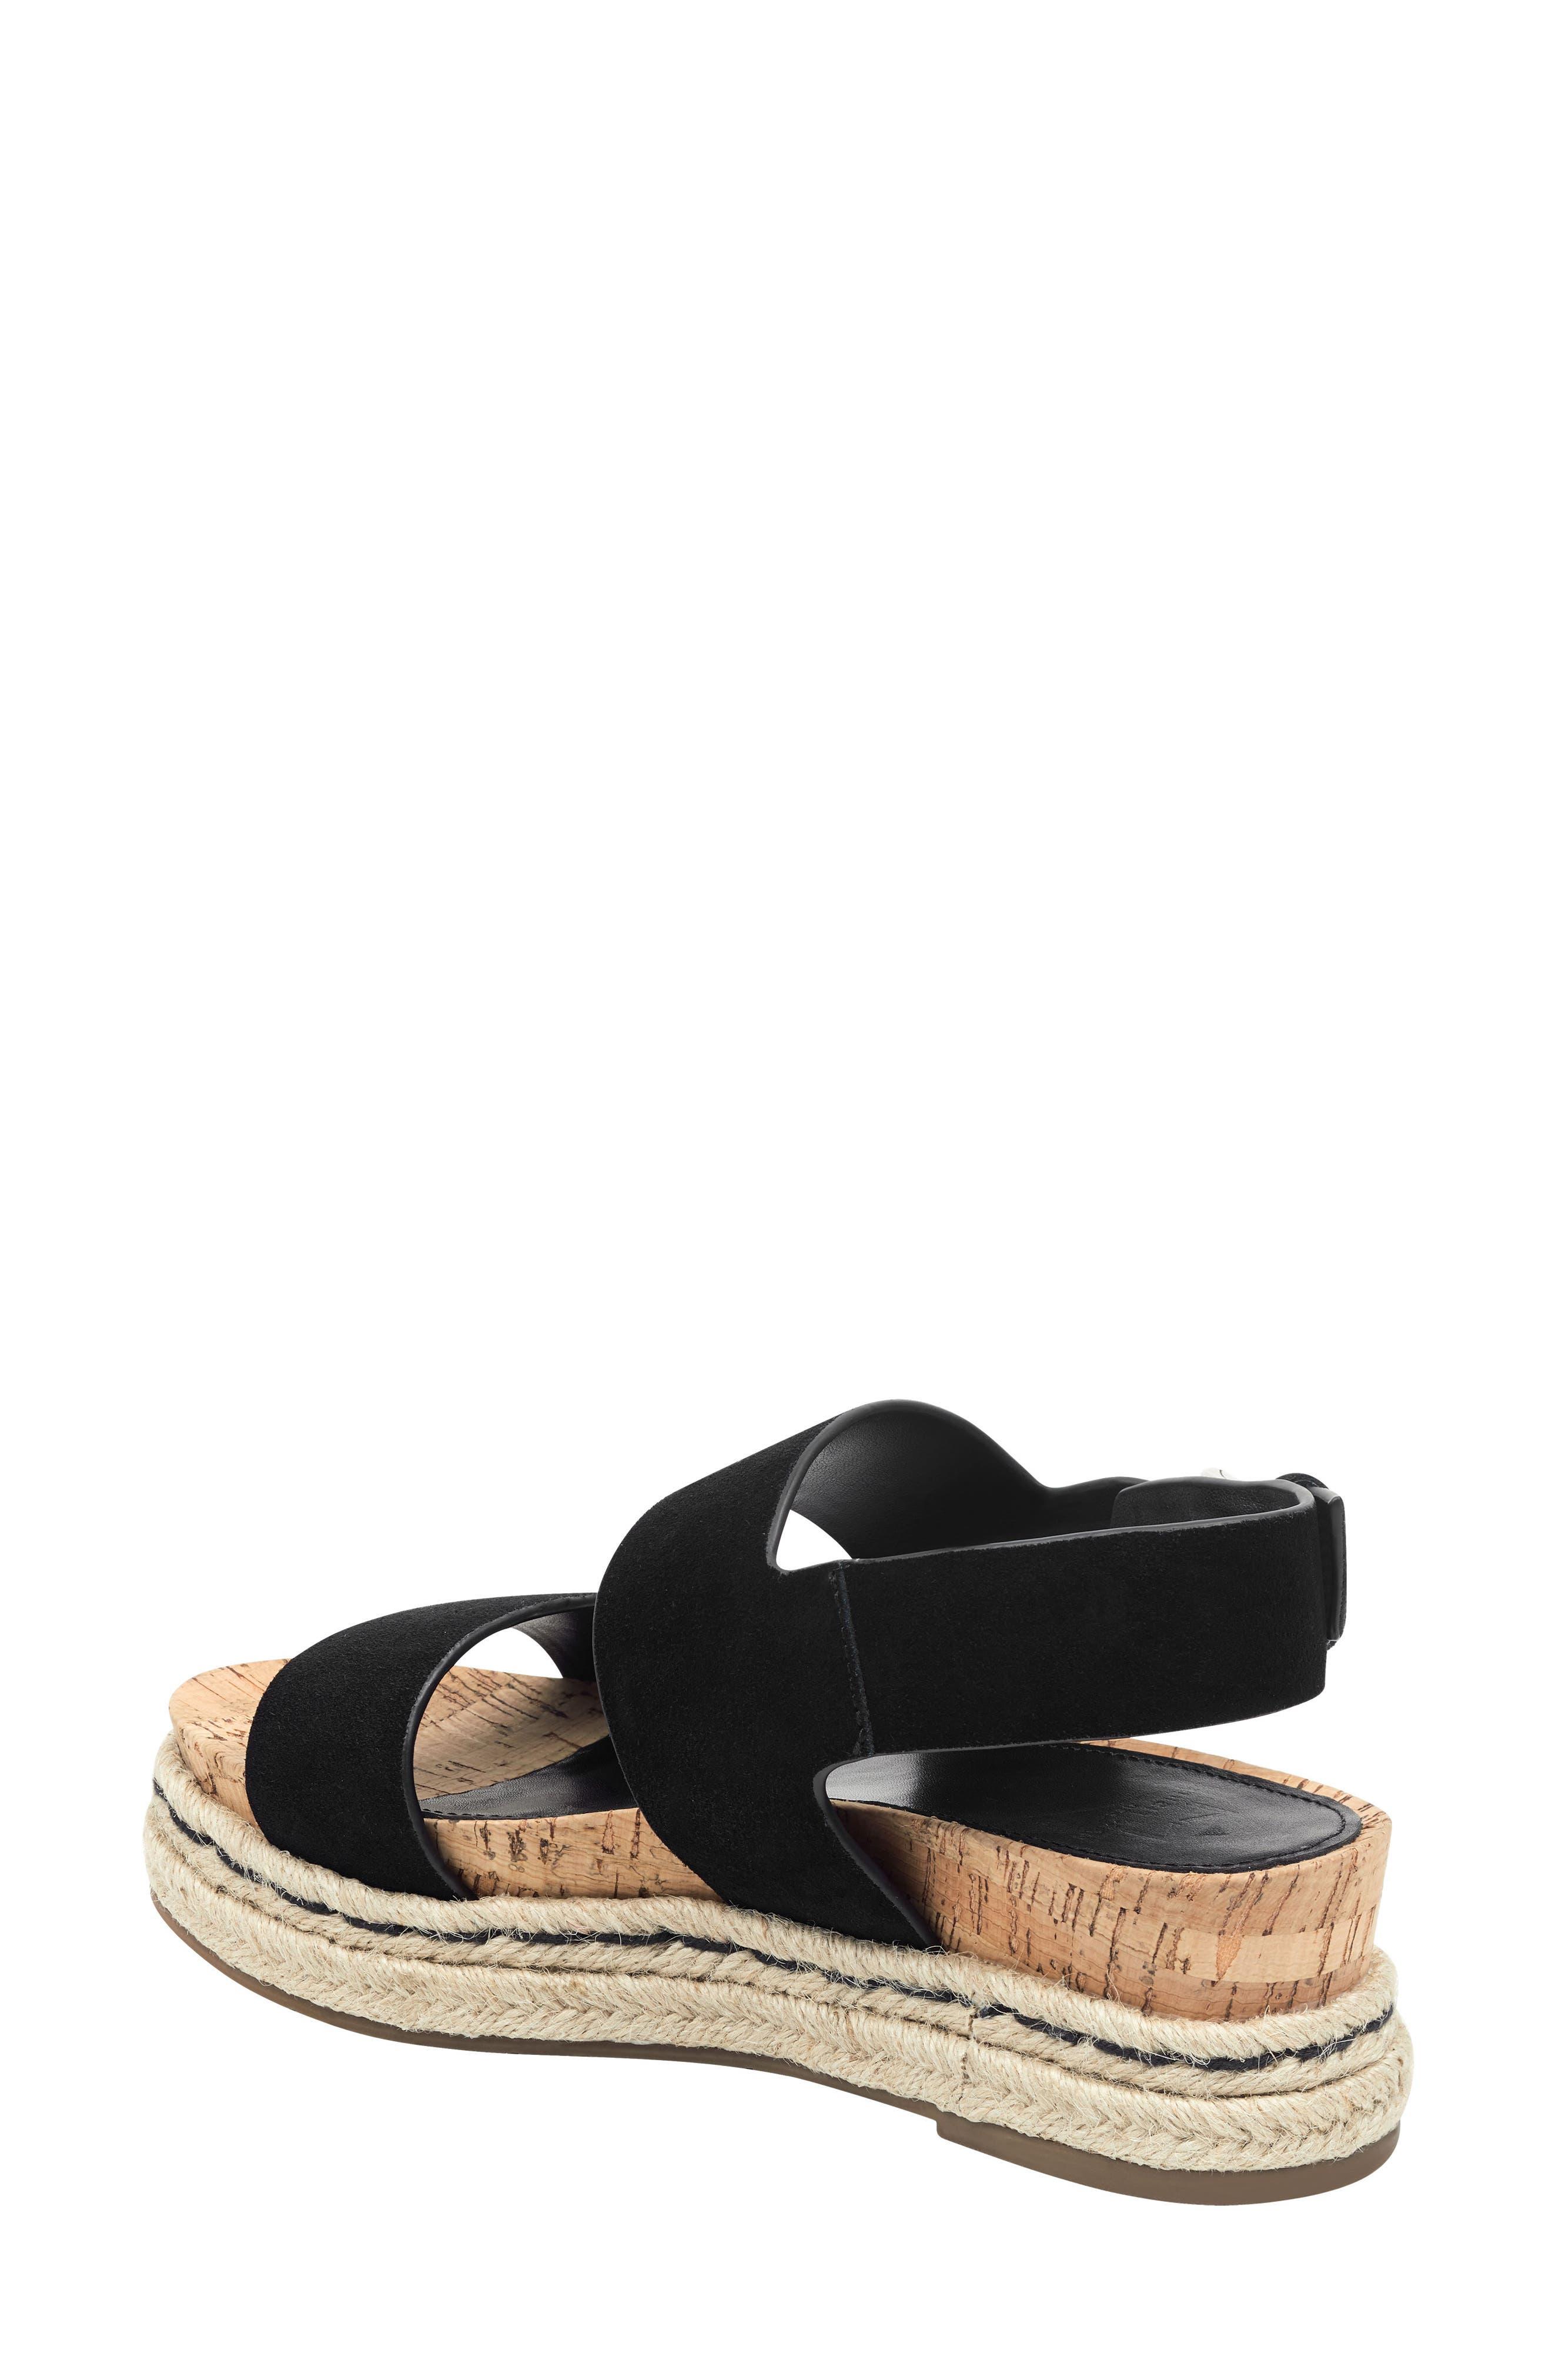 MARC FISHER LTD, Oria Espadrille Platform Sandal, Alternate thumbnail 2, color, BLACK SUEDE